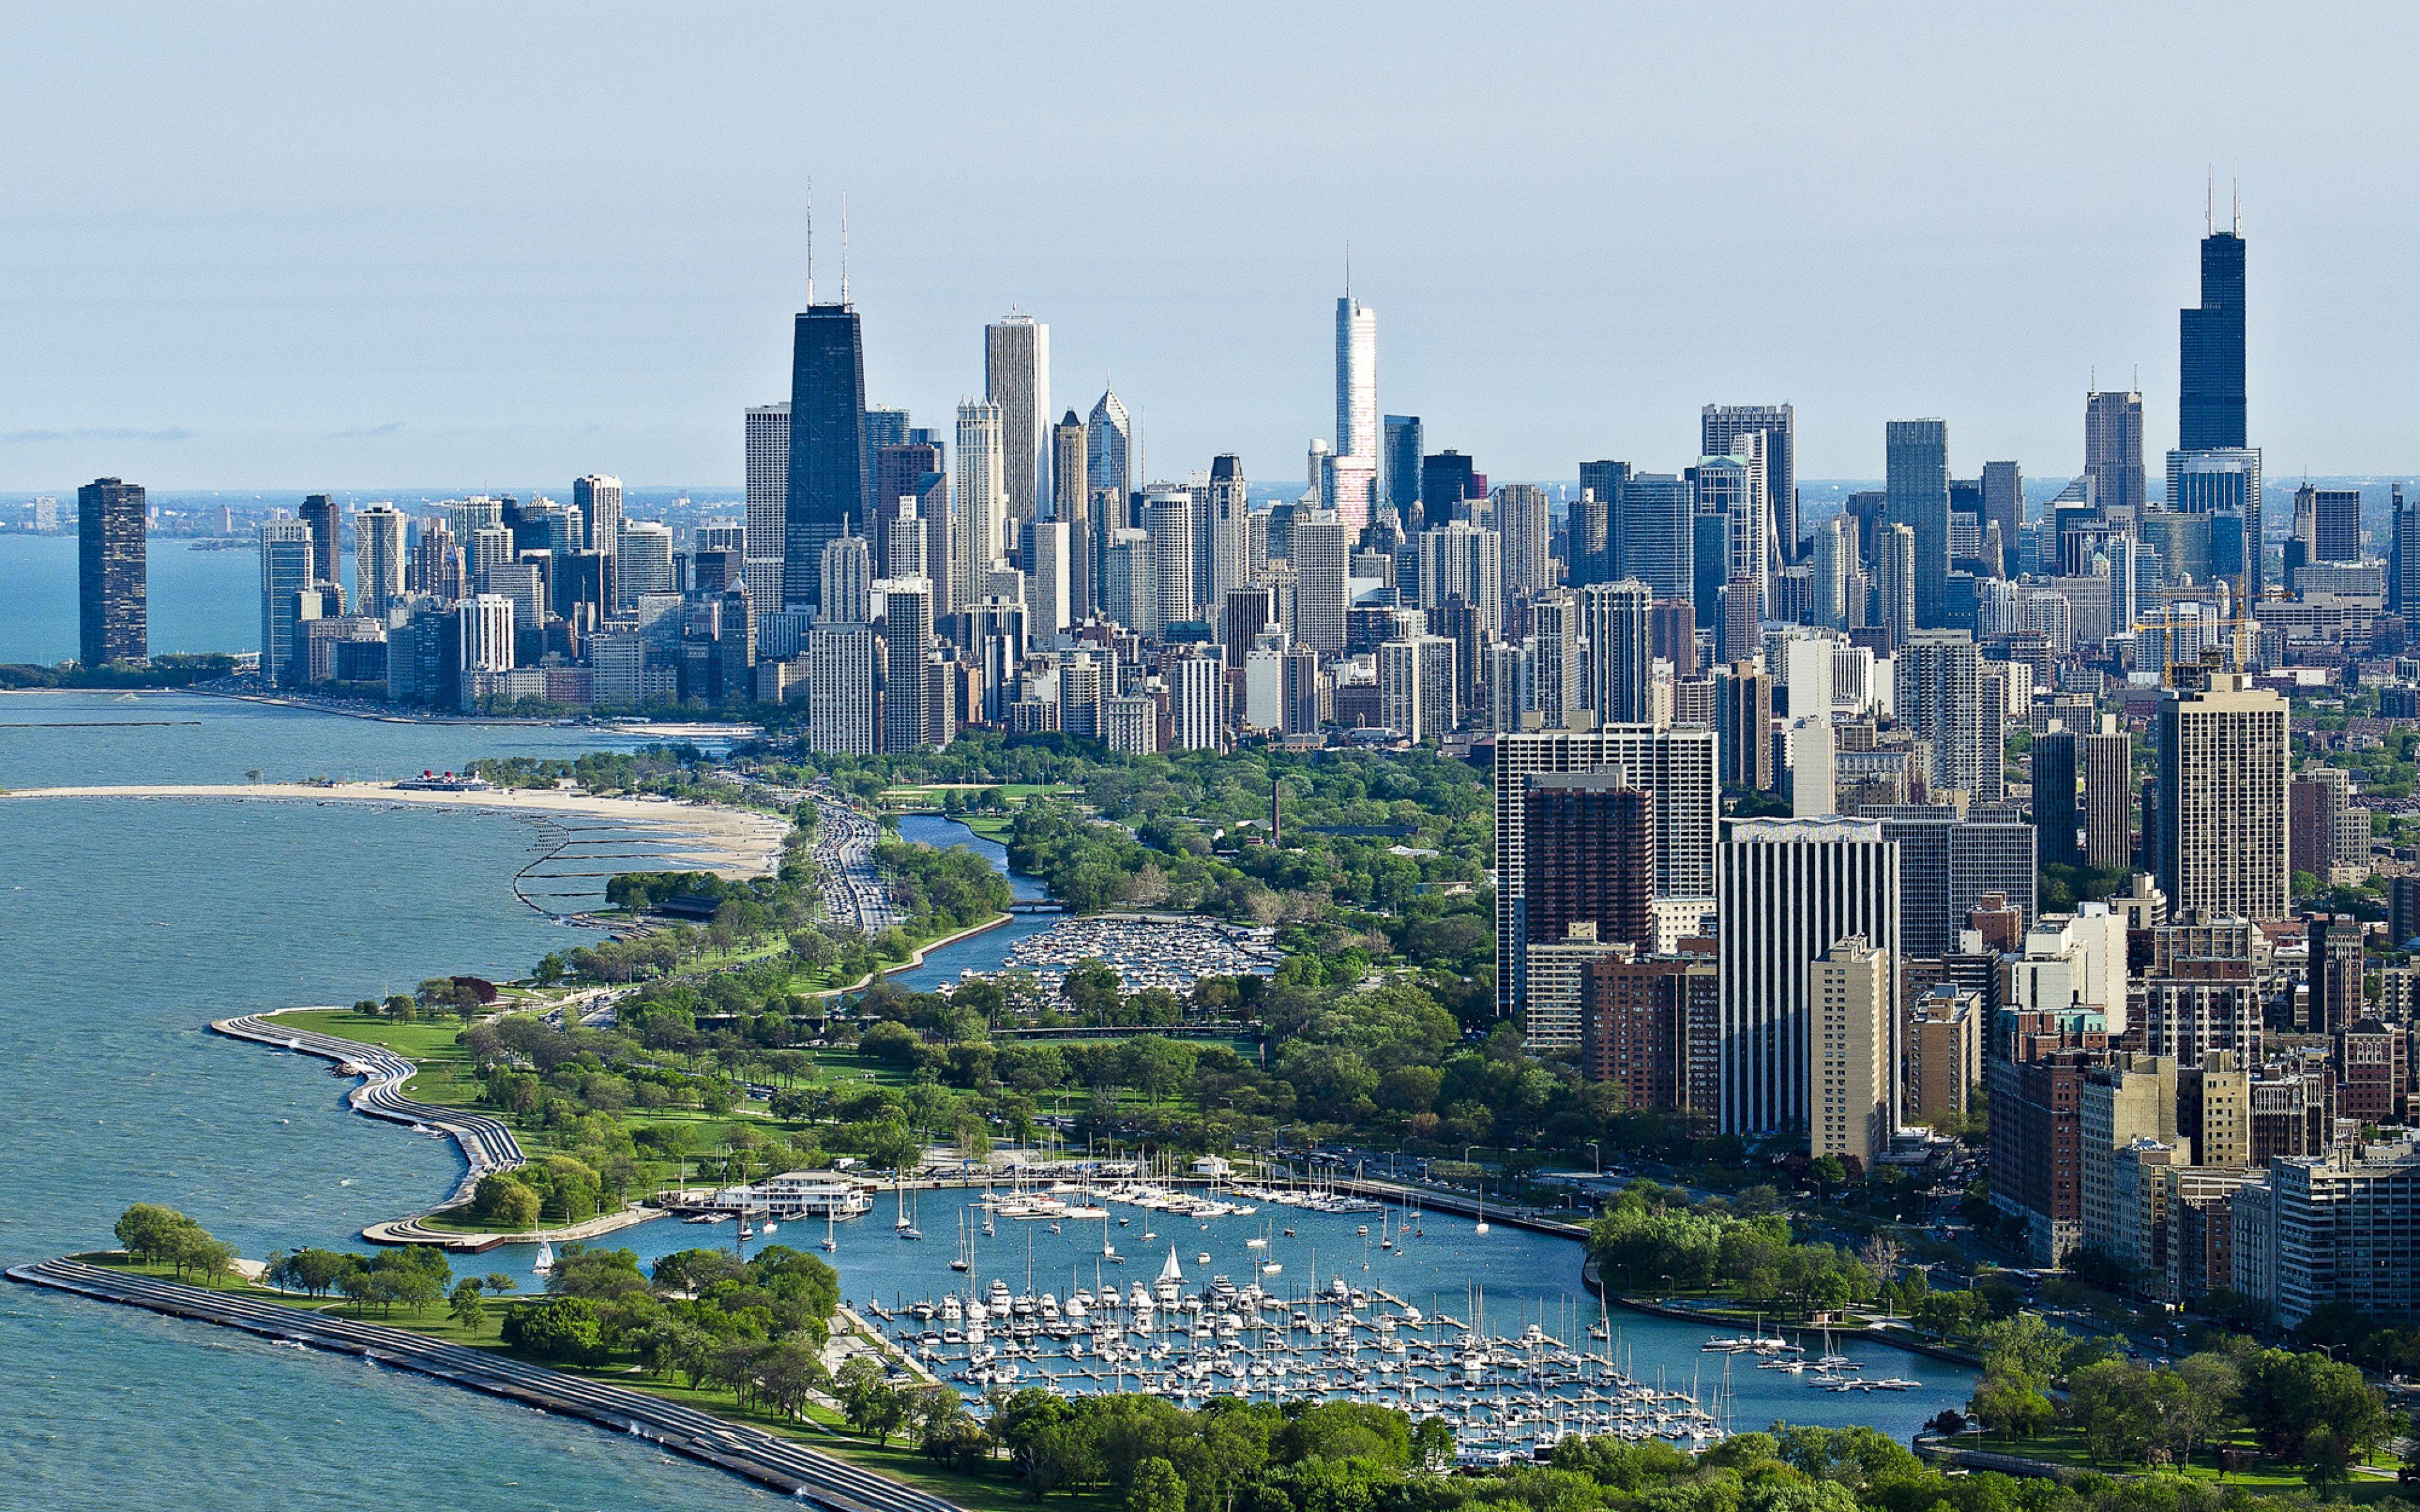 Chicago Wallpaper Free Ewk Chicago Wallpaper City Wallpaper Cityscape Wallpaper